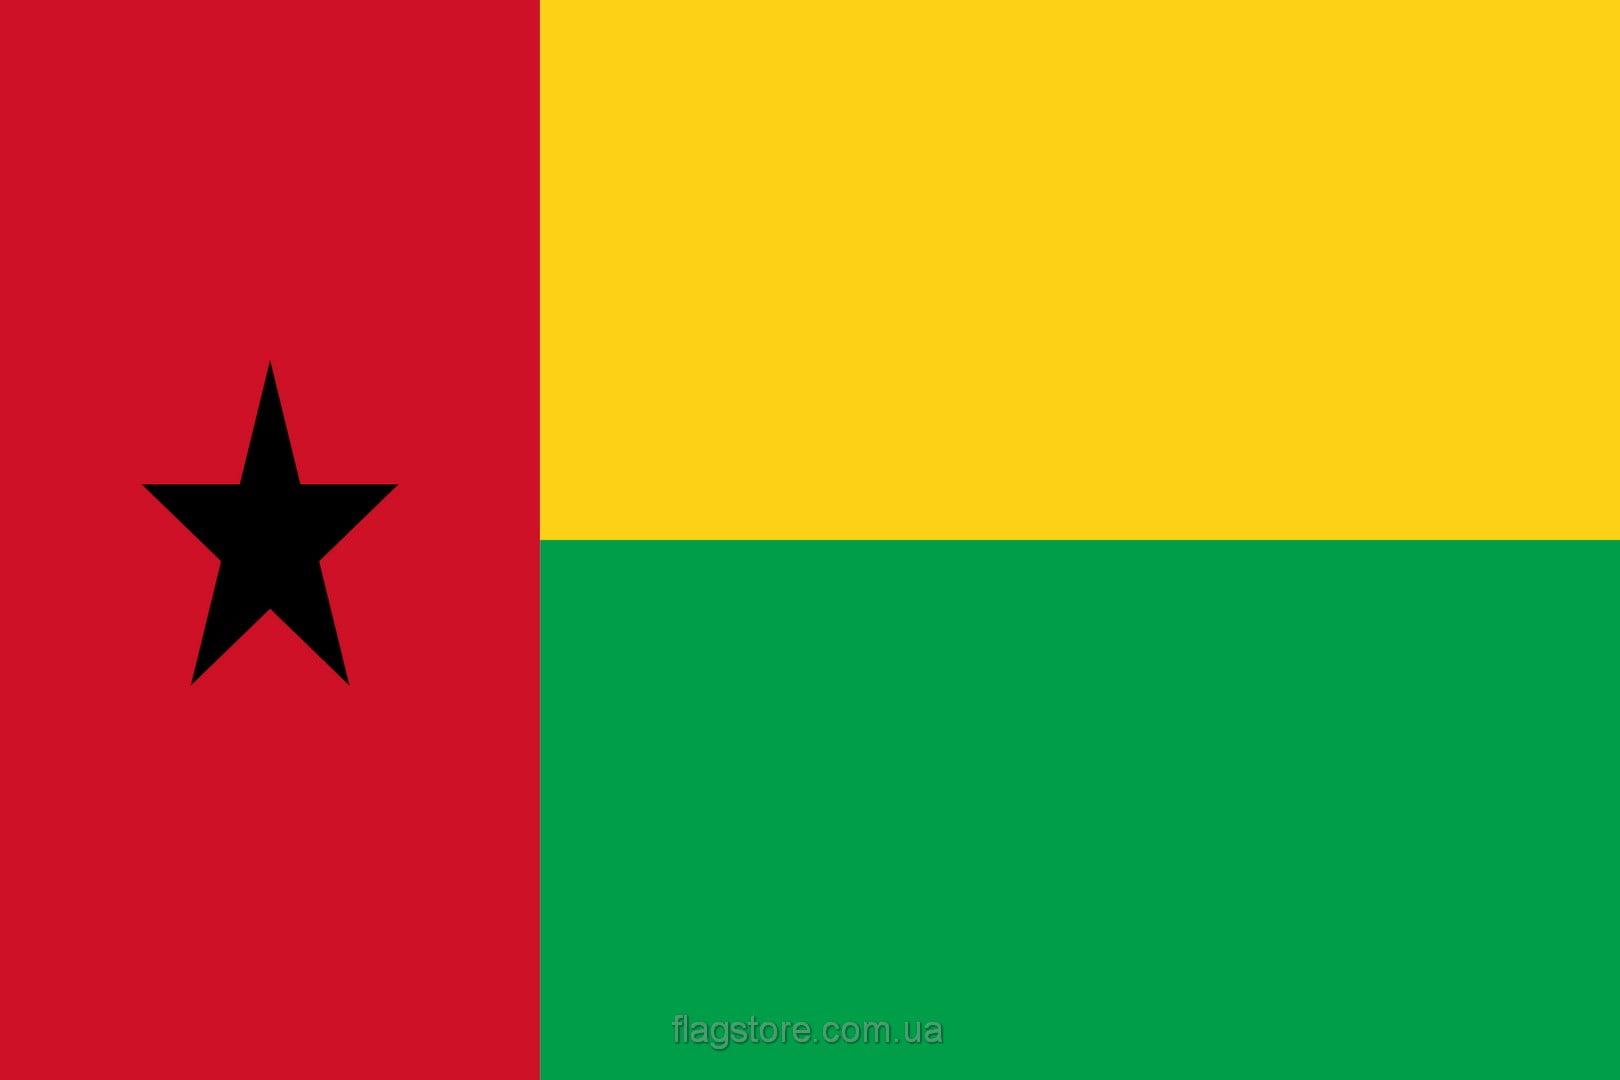 Купить флаг Гвинеи-Бисау (страны Гвинея-Бисау)